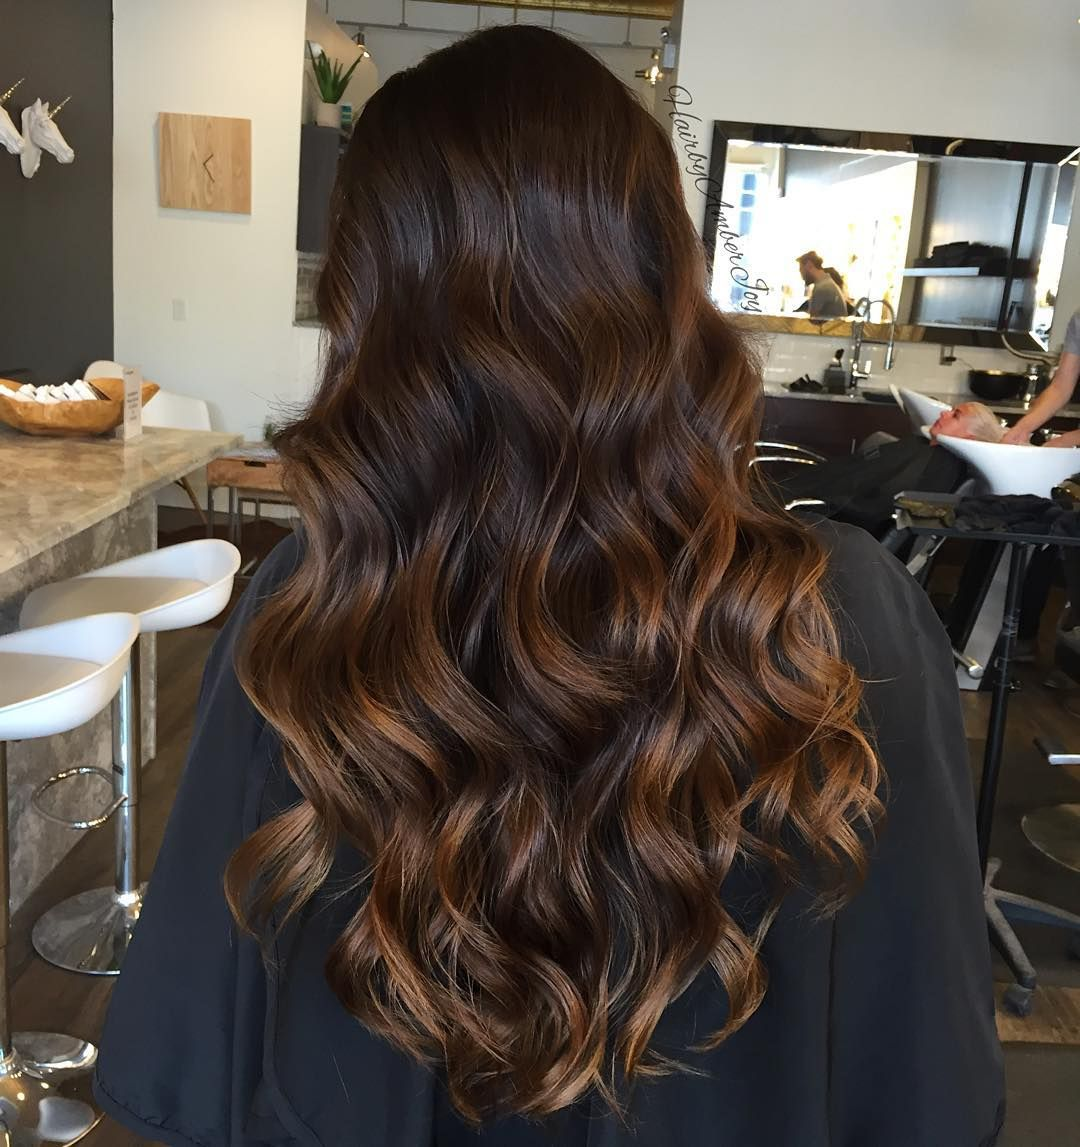 Hair Color Dark Brown Caramel Highlights Best Off The Shelf Hair